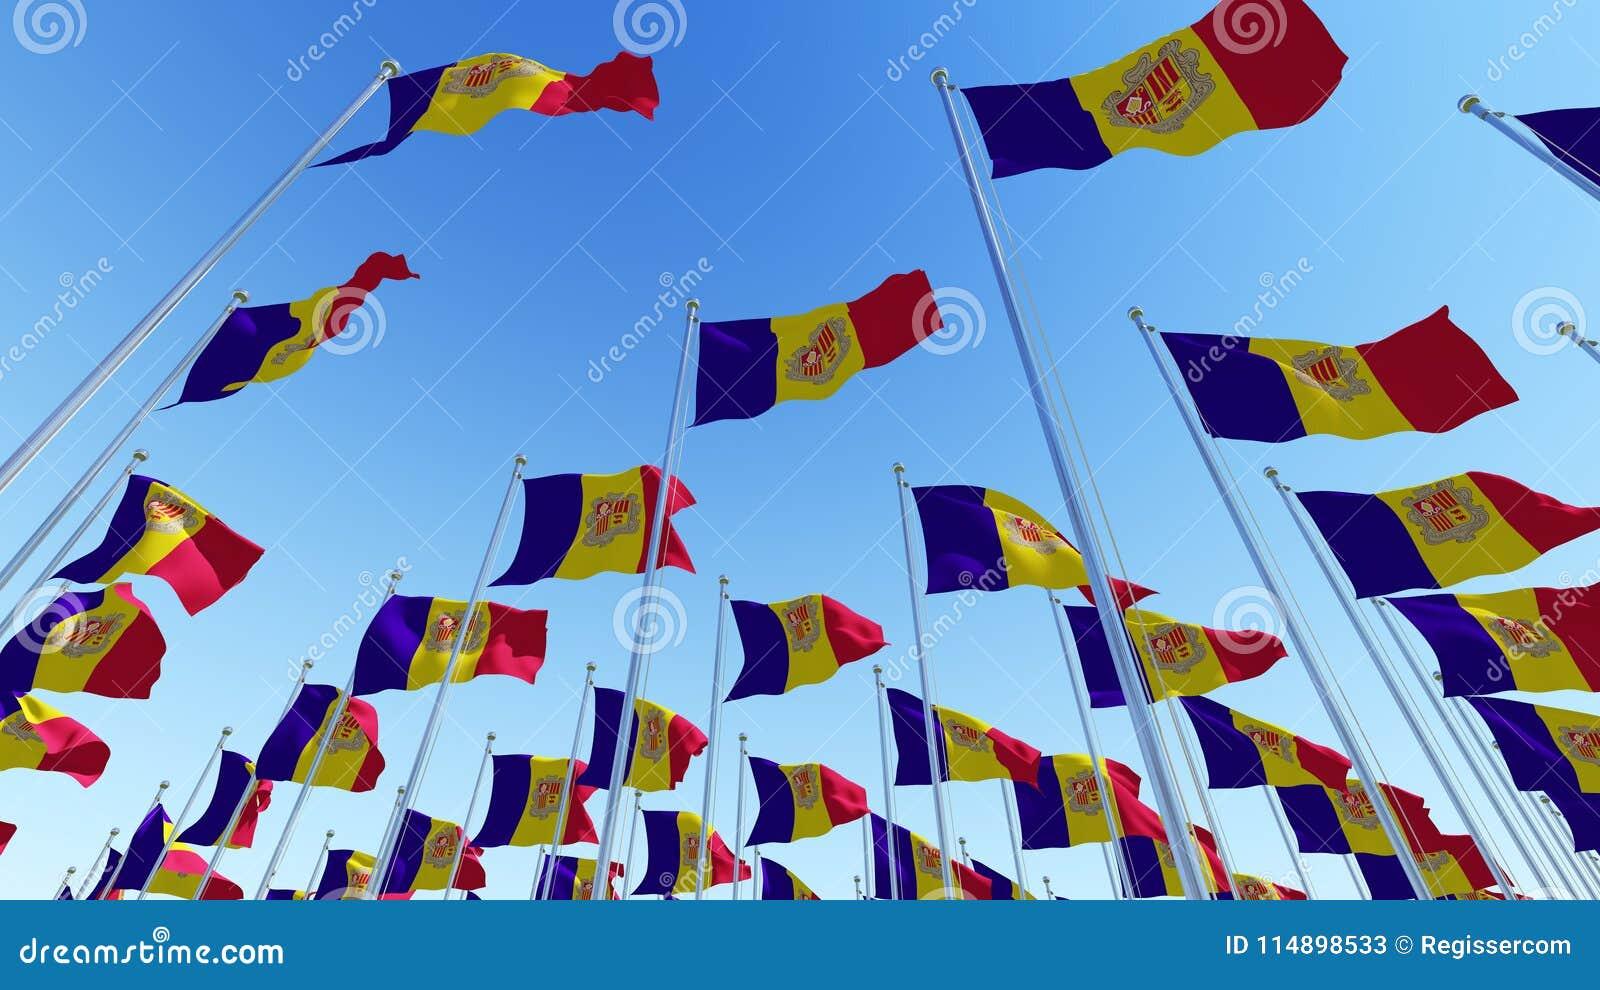 Waving Flags of Andorra against blue sky.